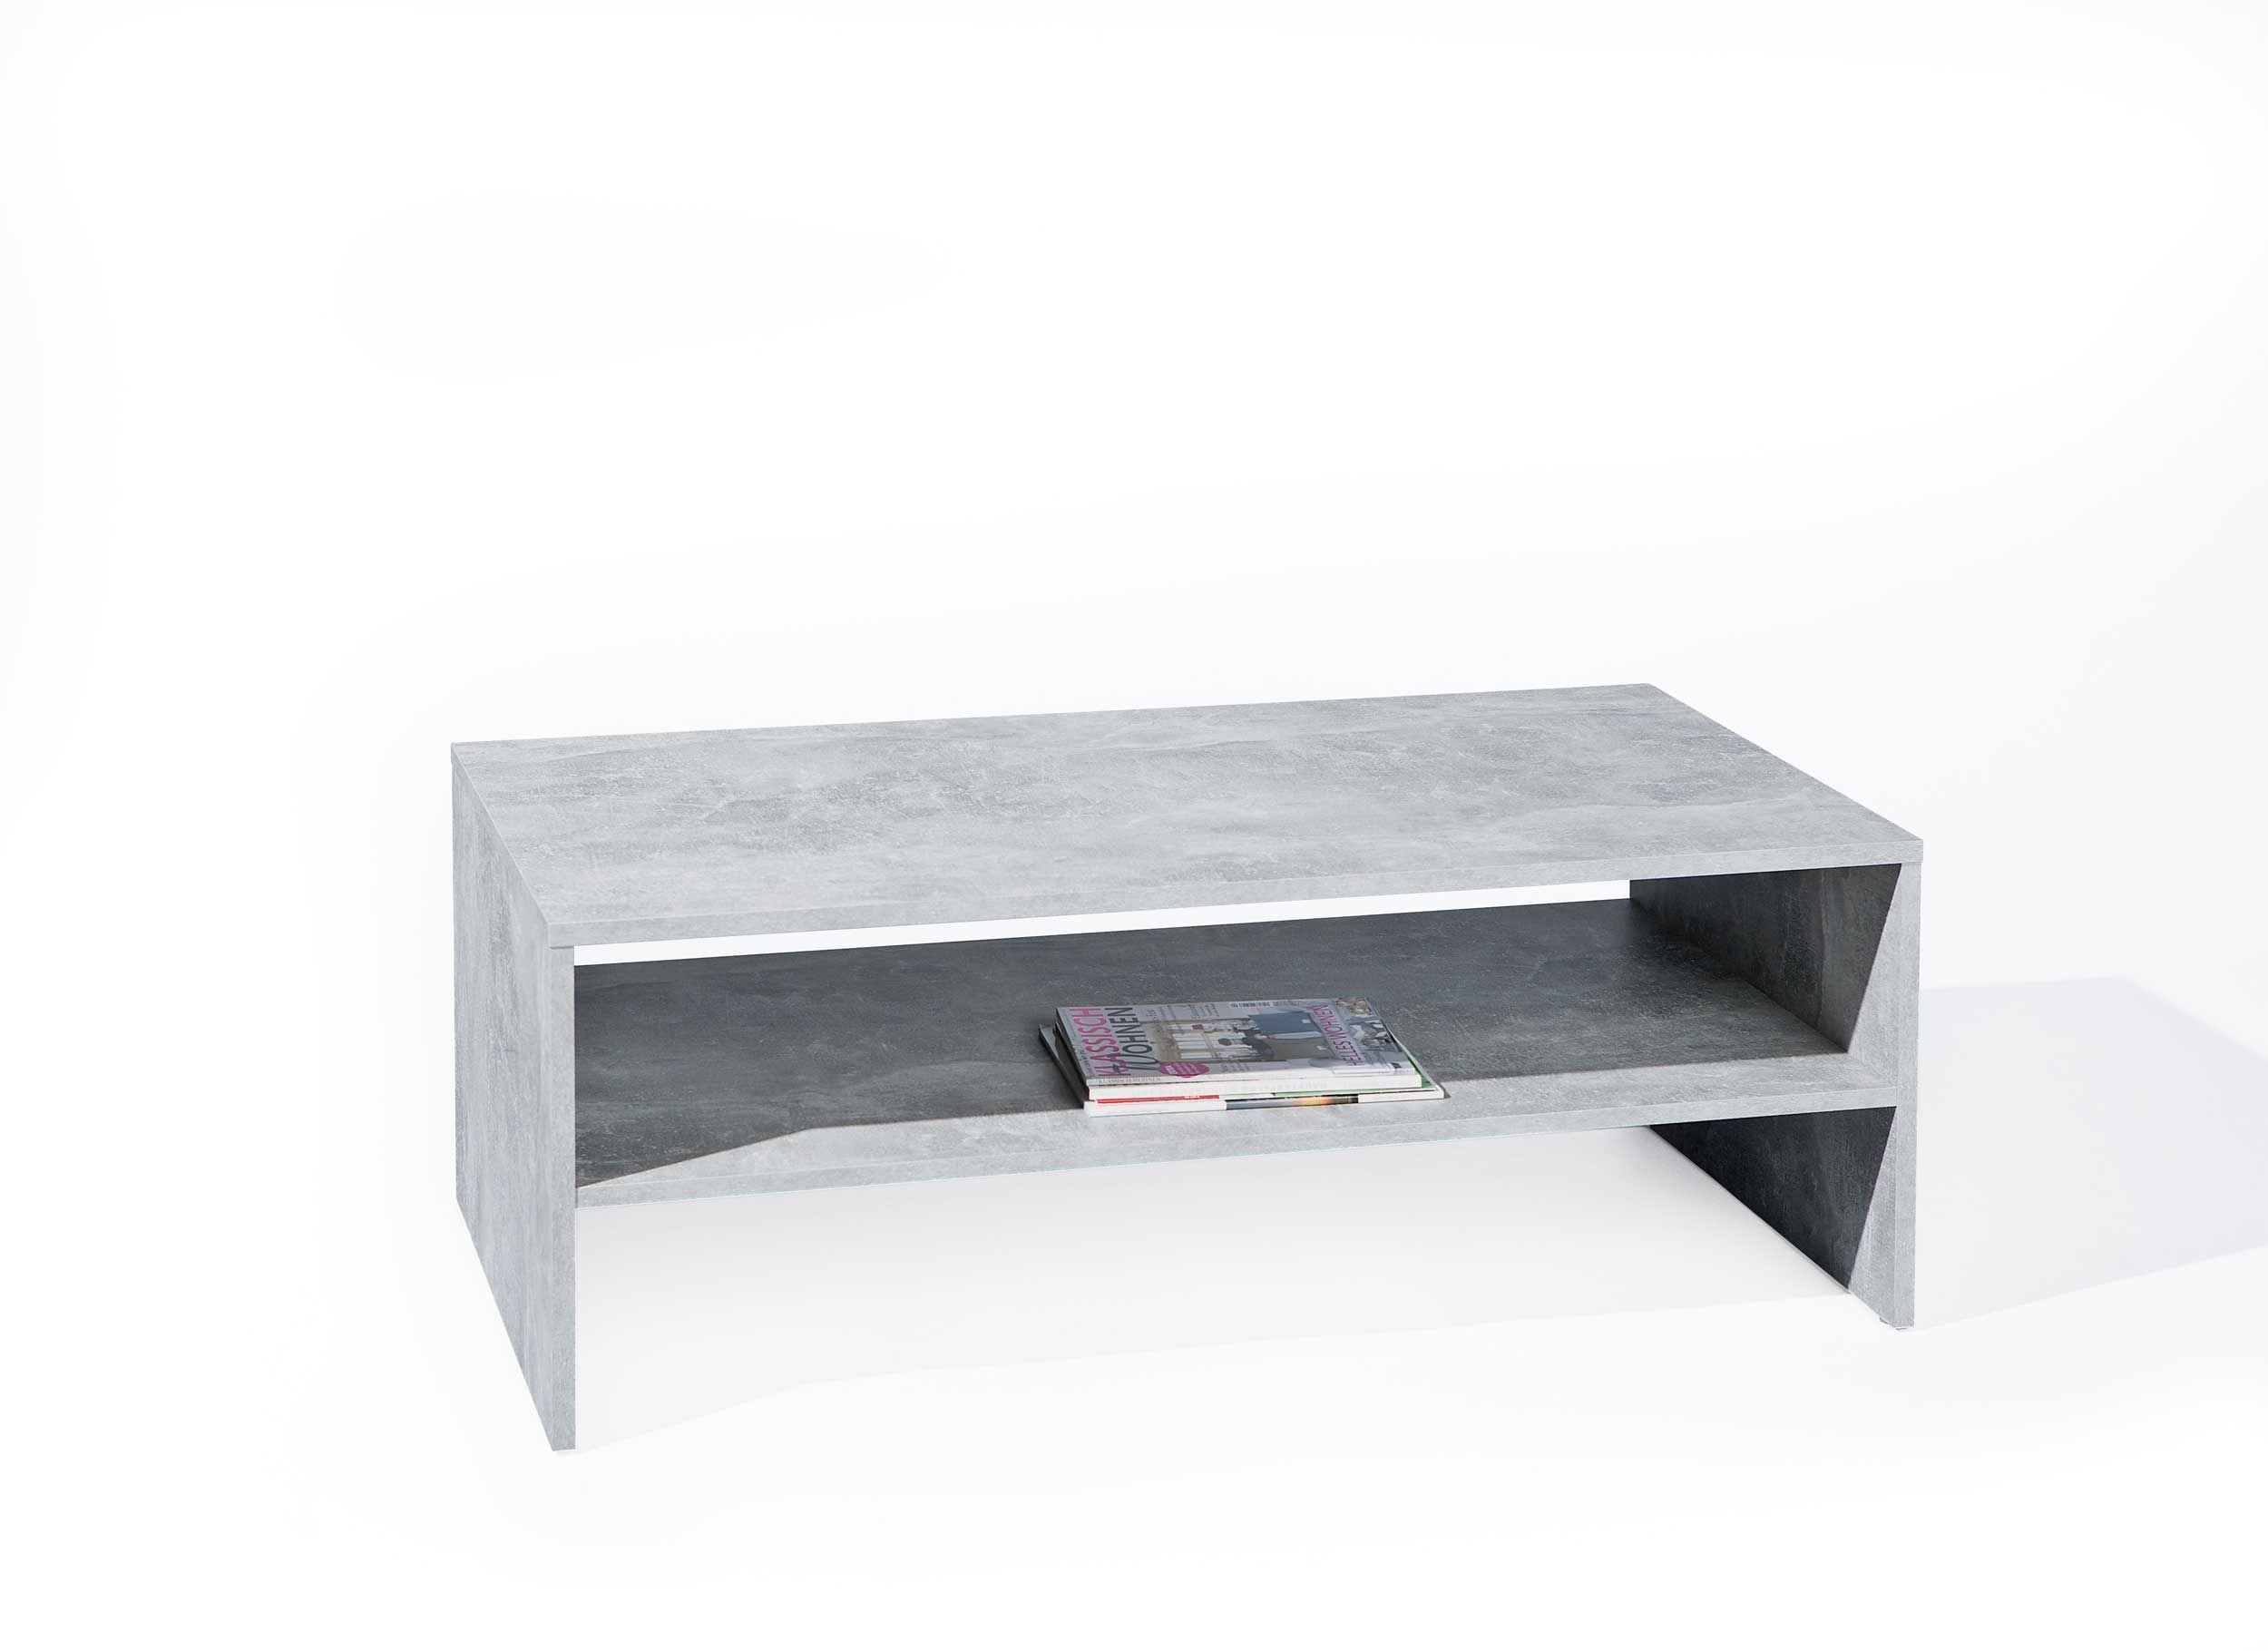 table basse beton 115x60 industriel gris